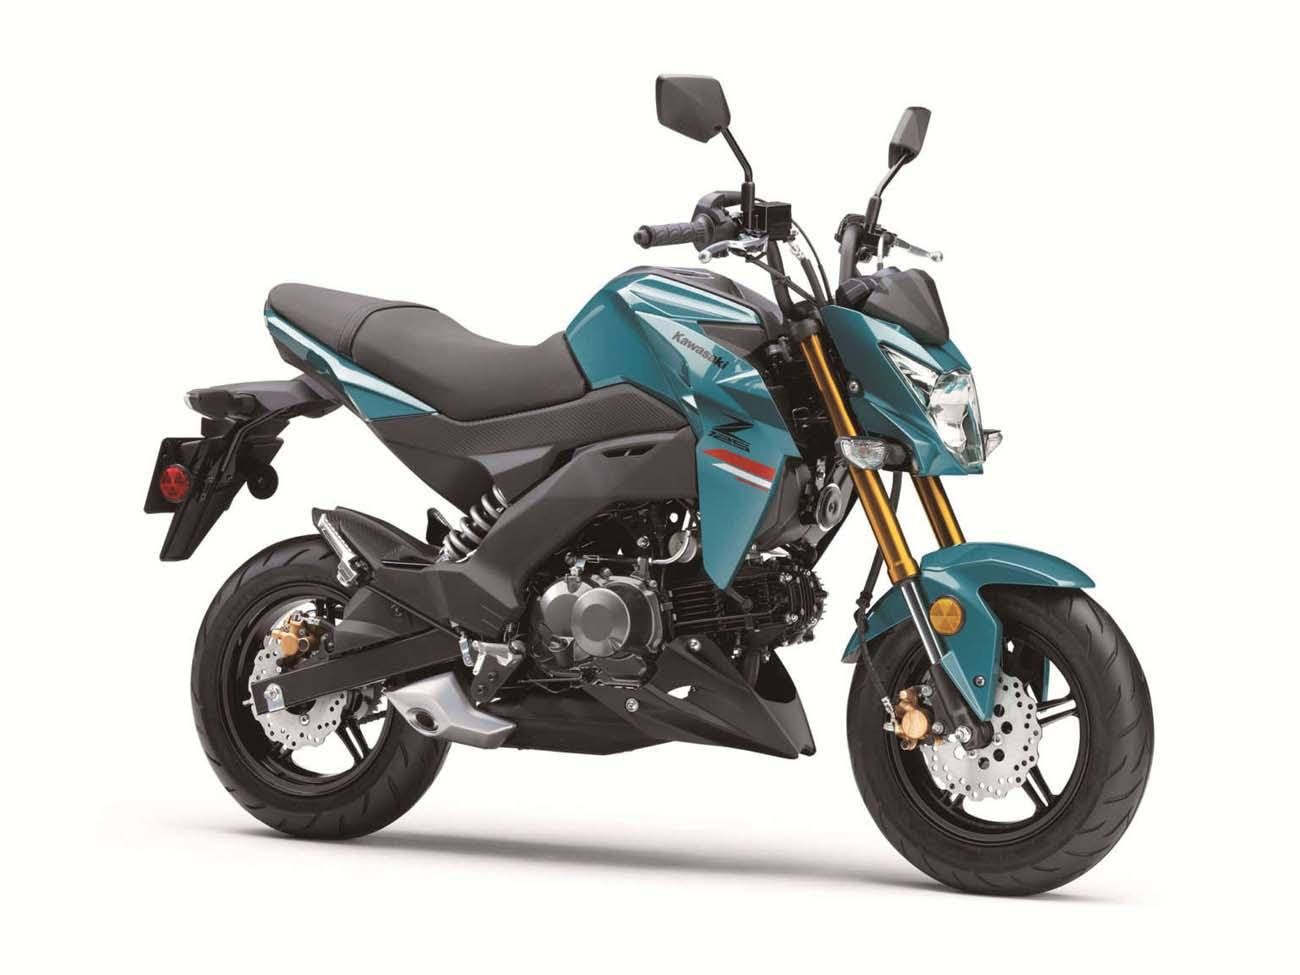 Kawasaki Z125 technical specifications